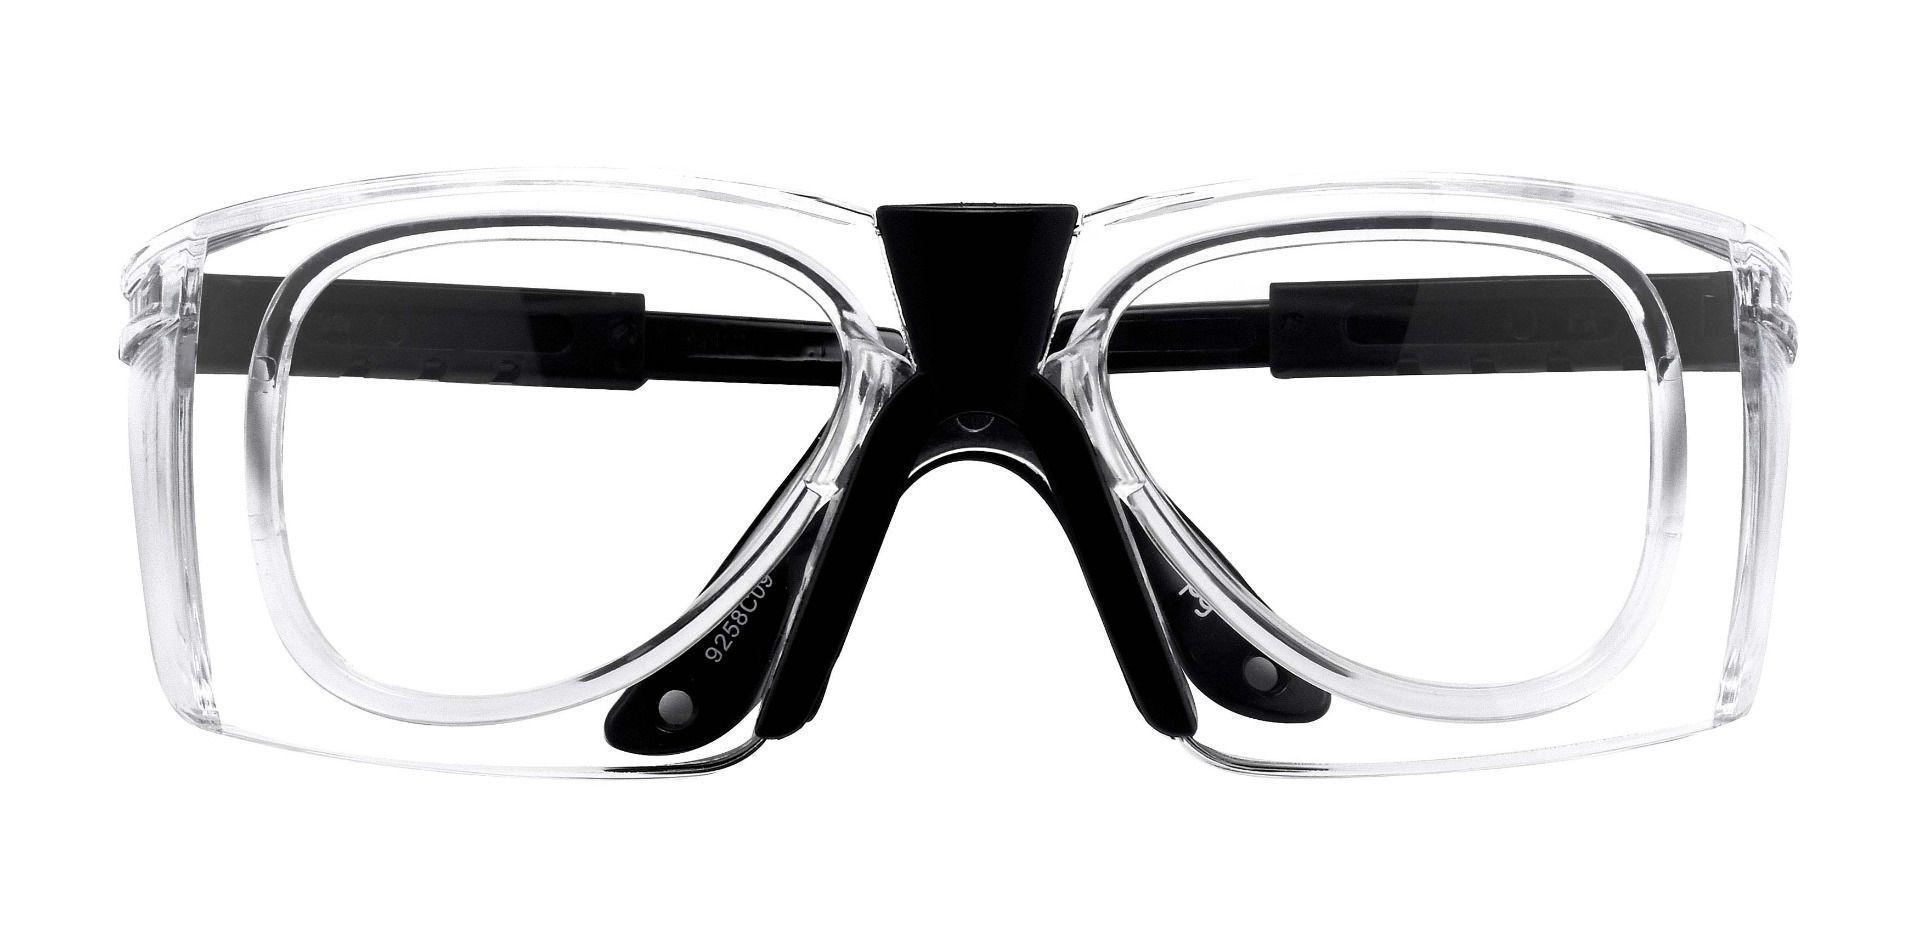 Nelson Sports Glasses Prescription Glasses - Clear